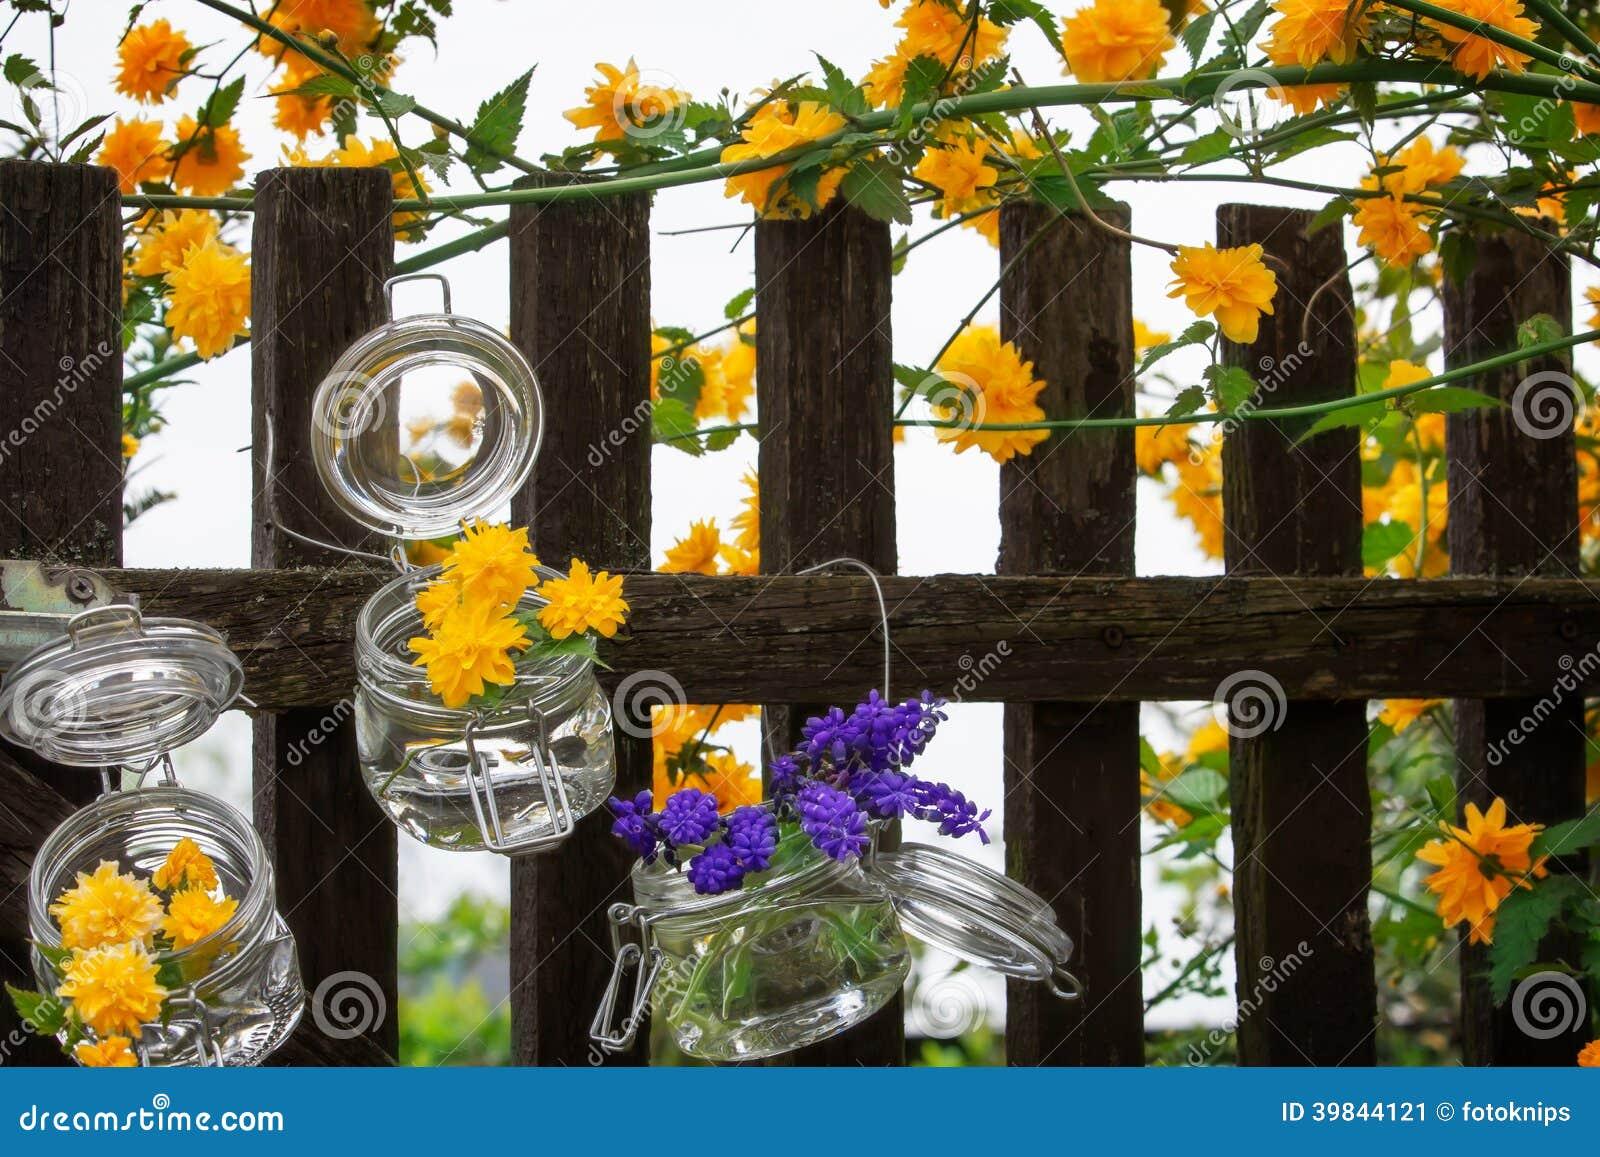 D coration florale la porte de jardin photo stock for Decoration porte jardin